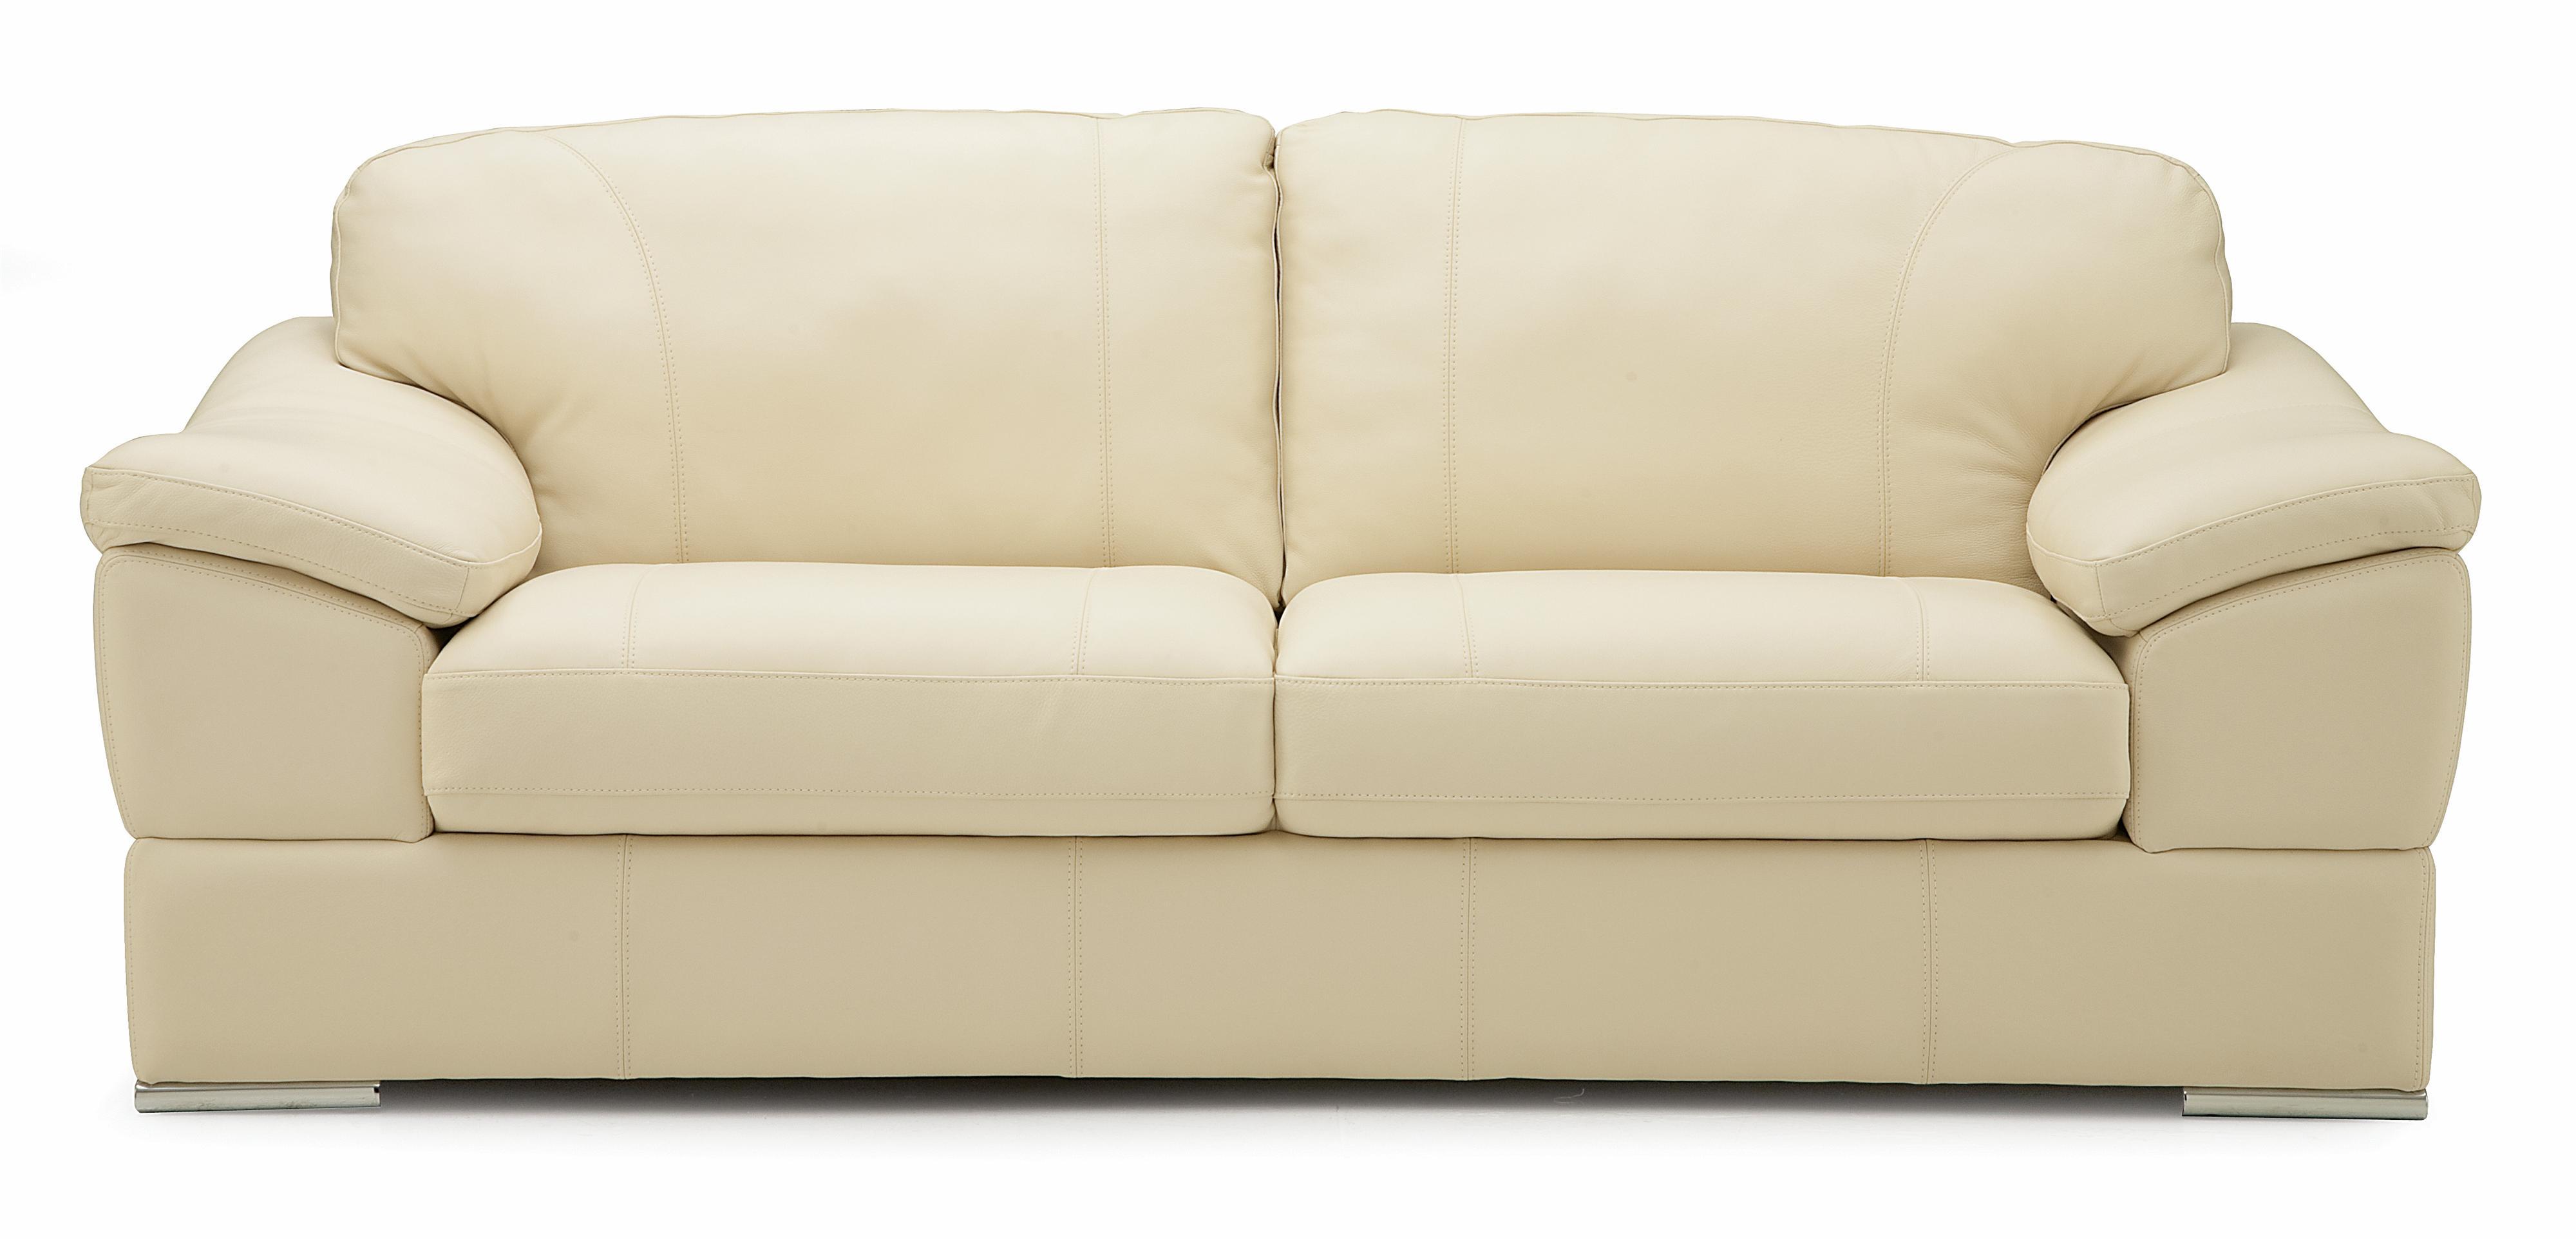 Palliser Acapulco 2-Seater Stationary Sofa - Item Number: 77876-01